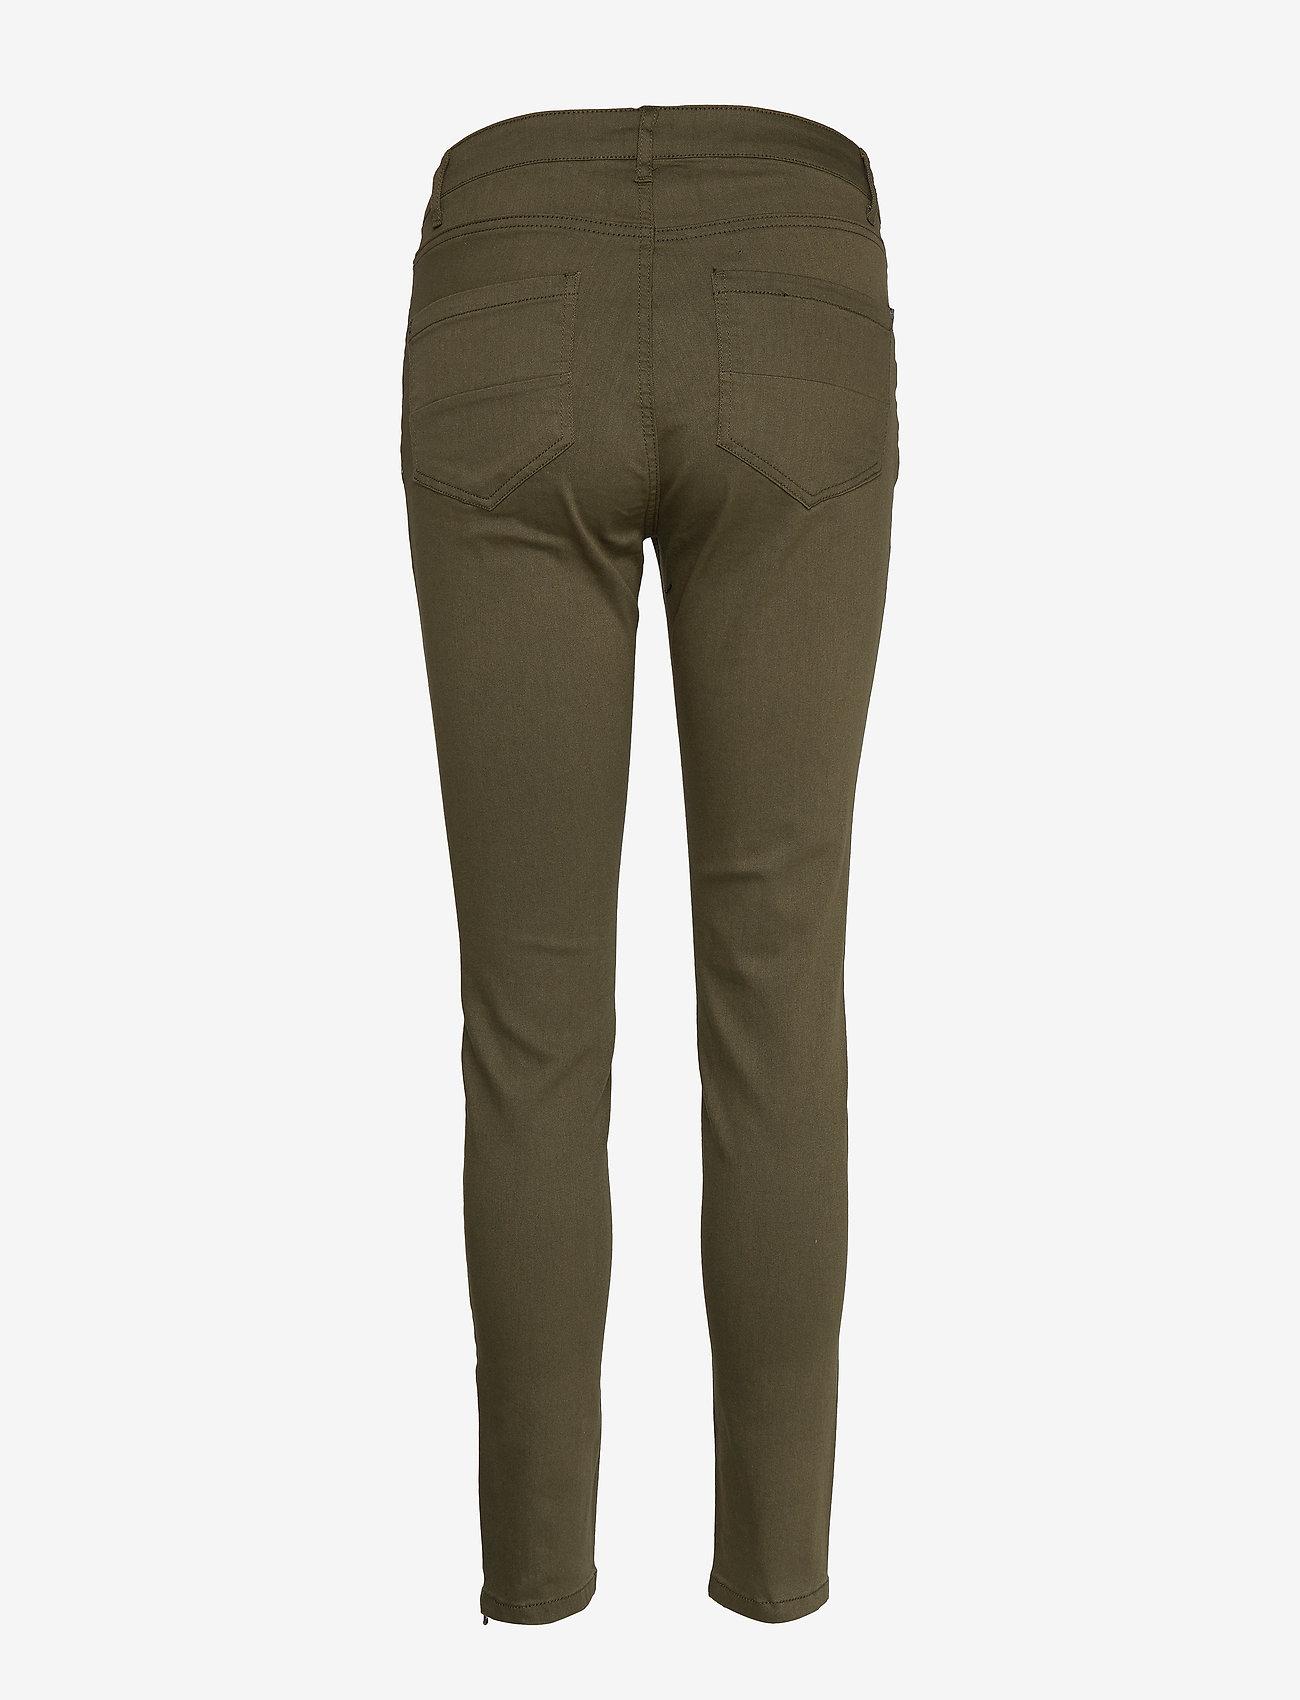 FREE/QUENT - FQAIDA-PA-7/8 - pantalons slim - olive night 19-0515 - 1